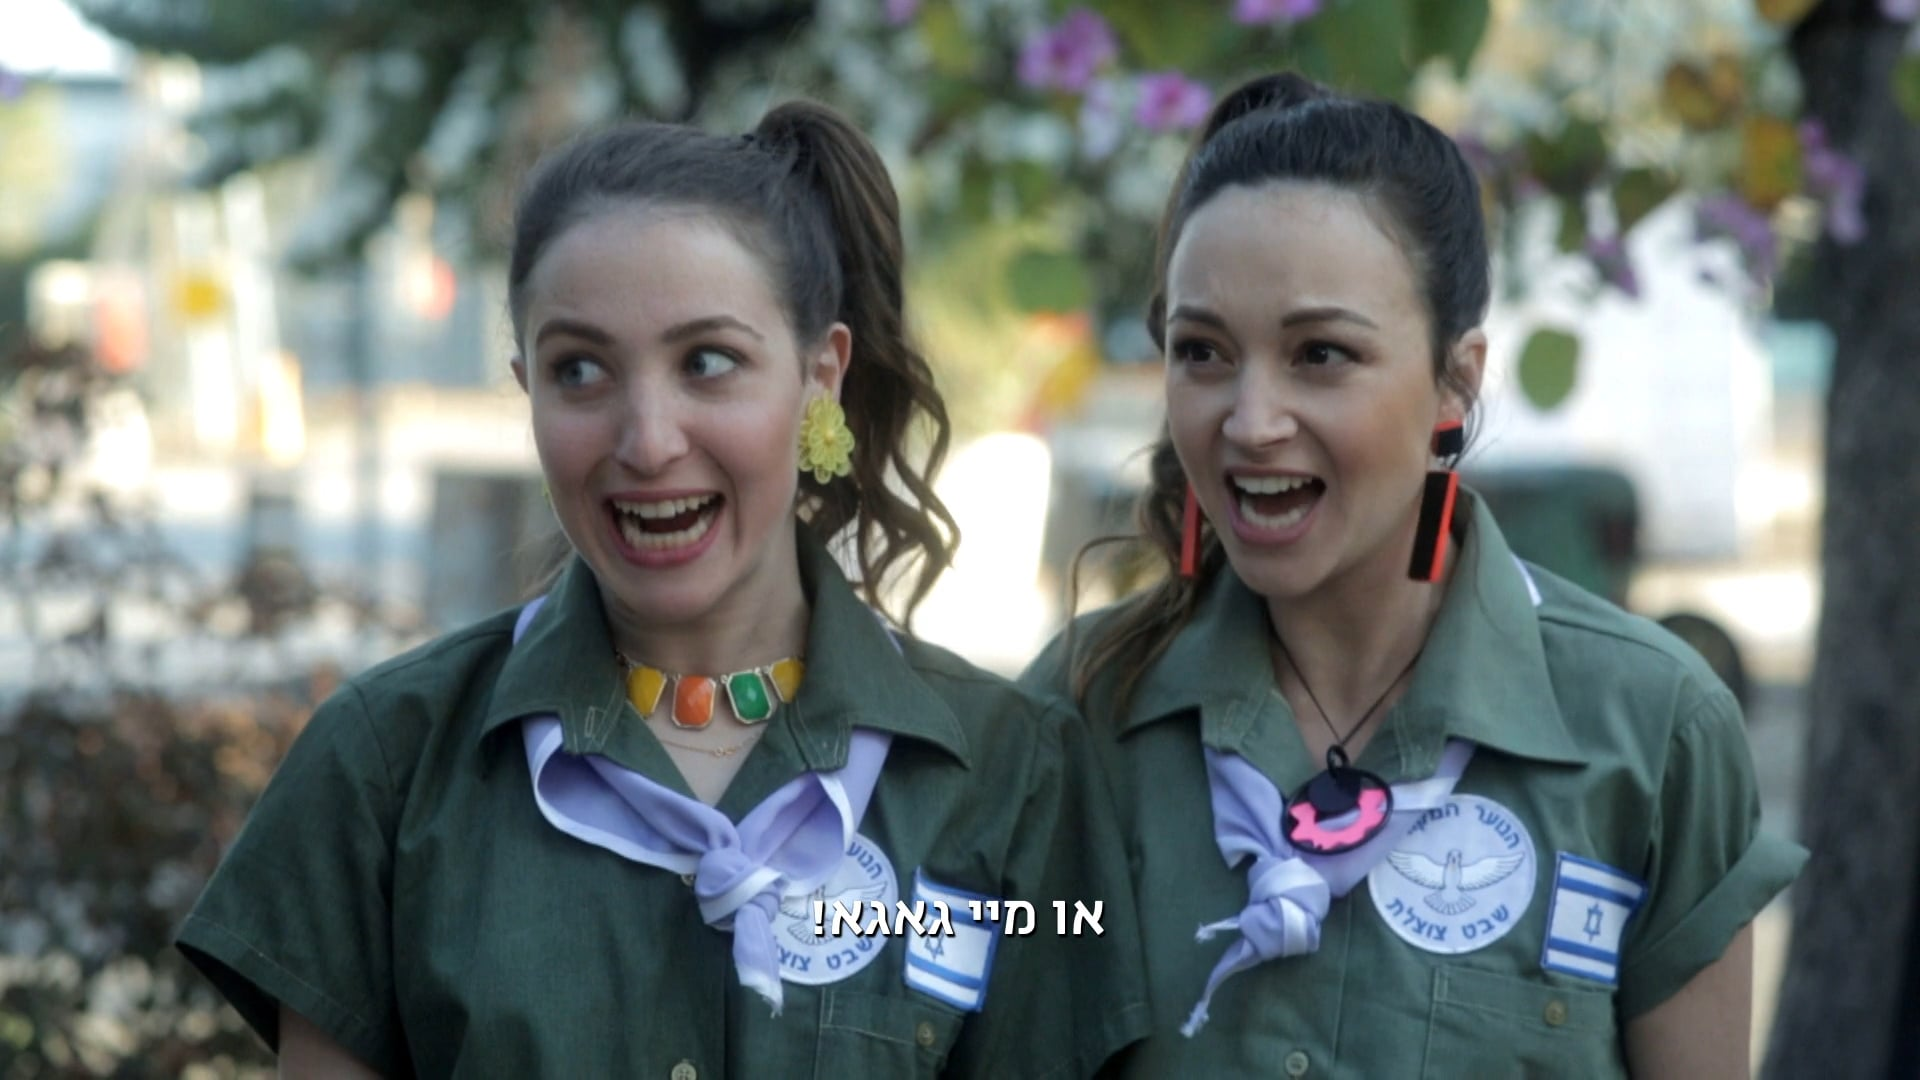 Noy & Hadar TV show for yesVOD Seanson 02 PROMO